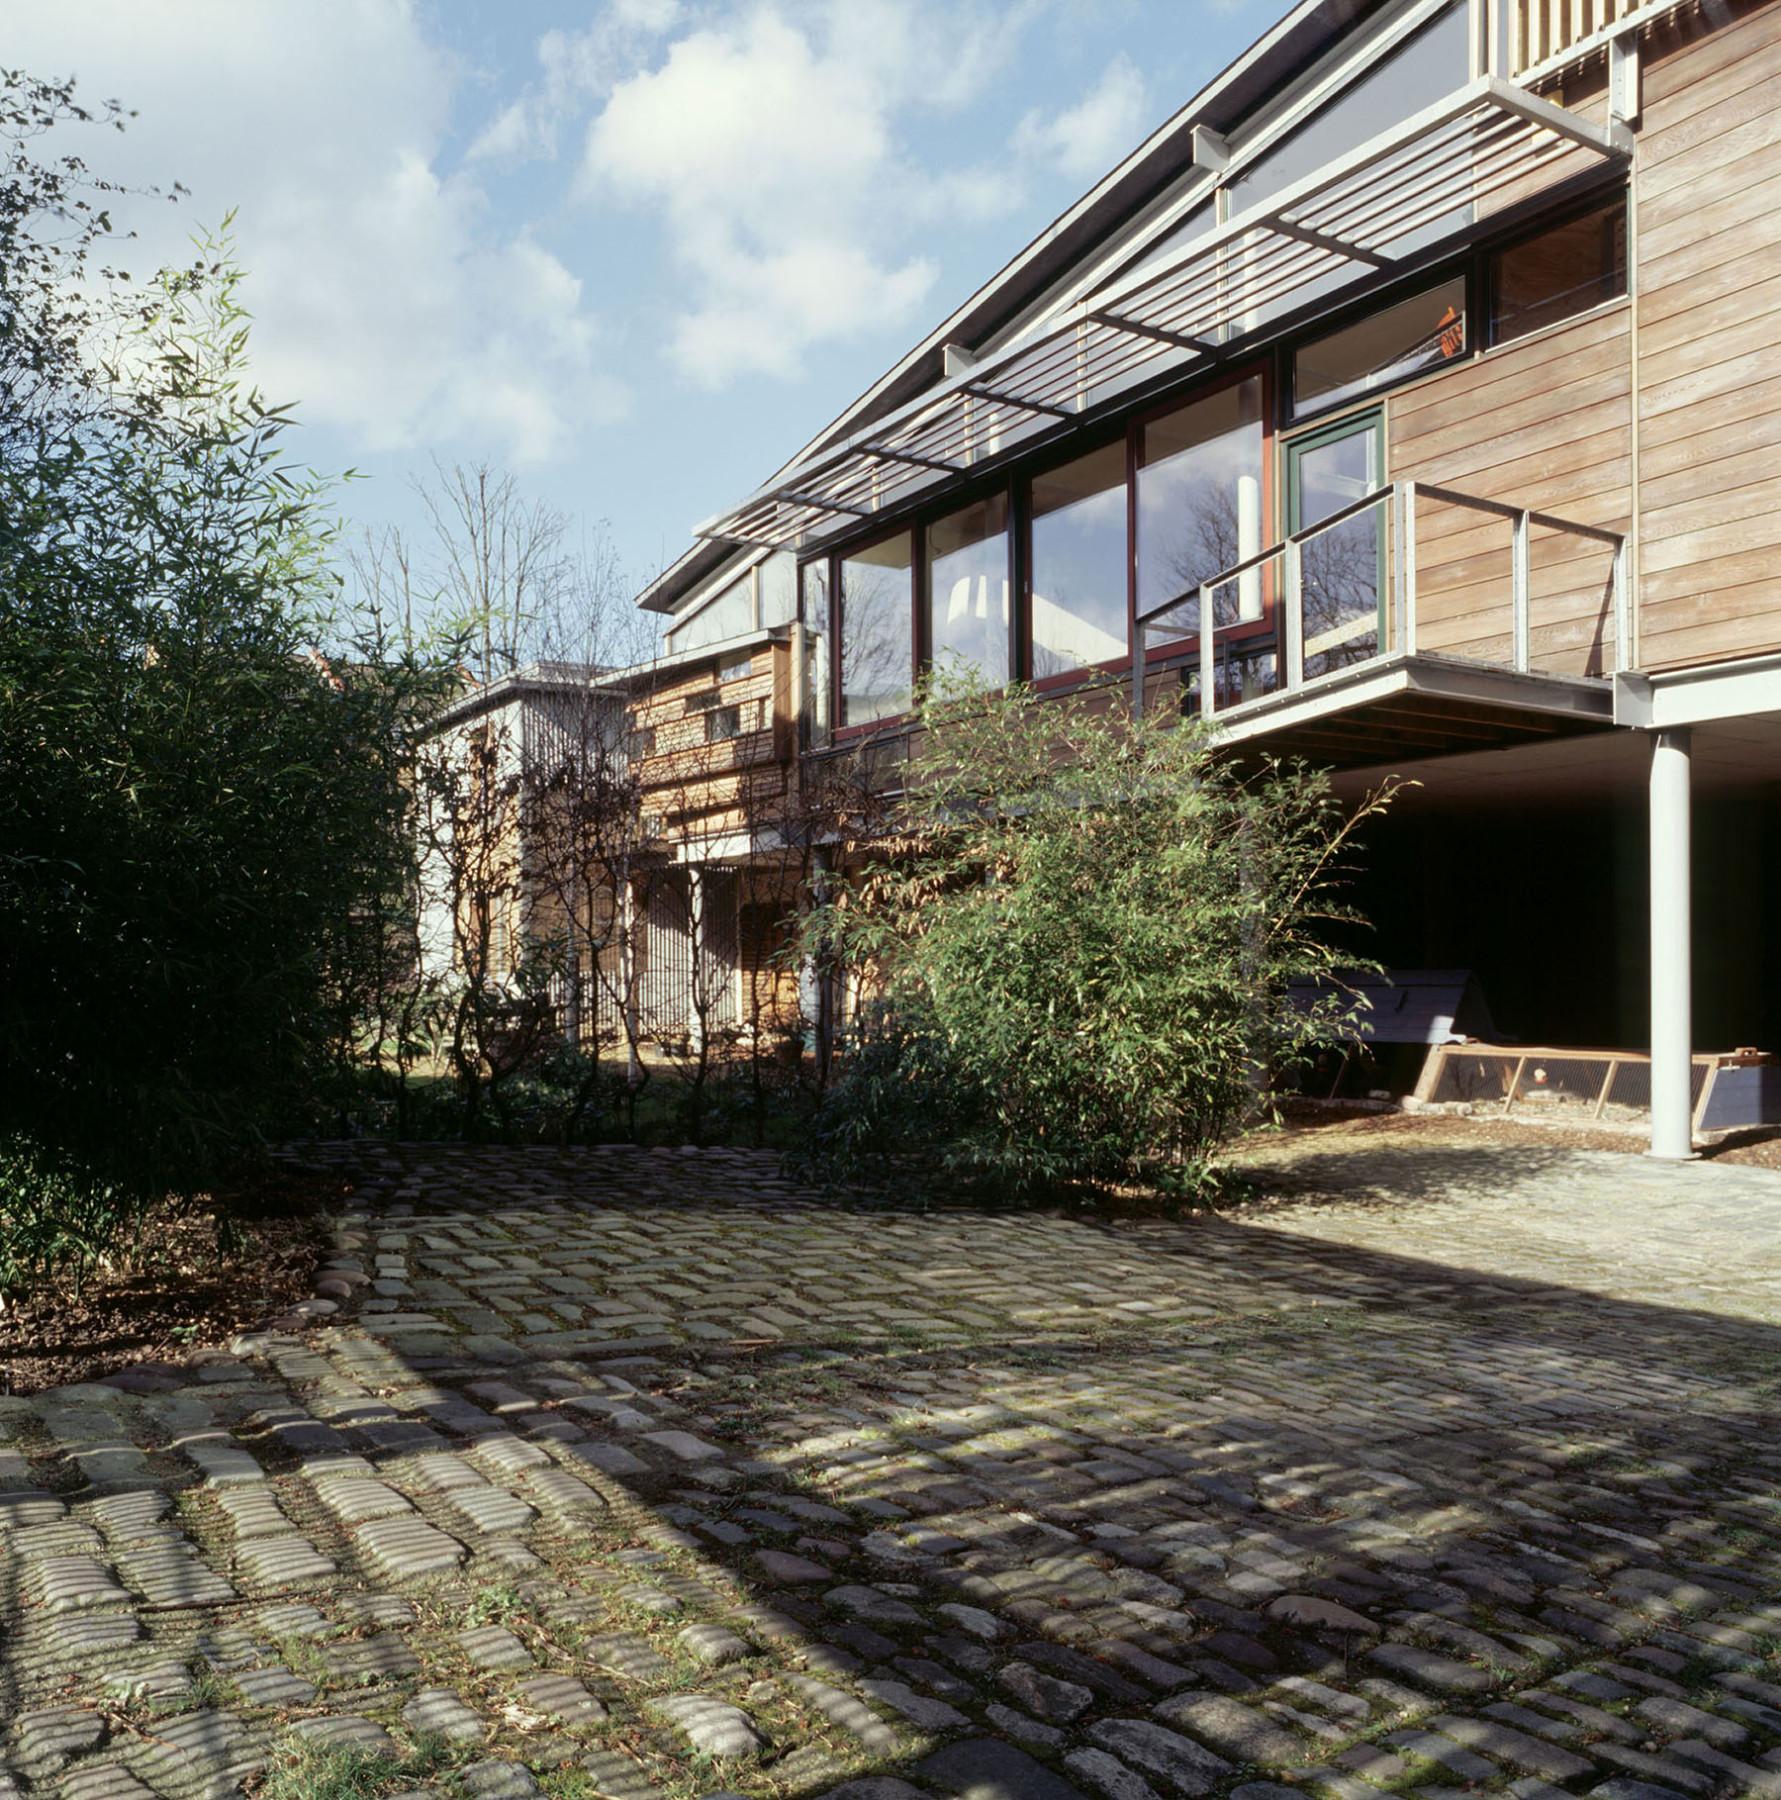 Sarah-Wigglesworth-Architects Stock Orchard Street court view 1800